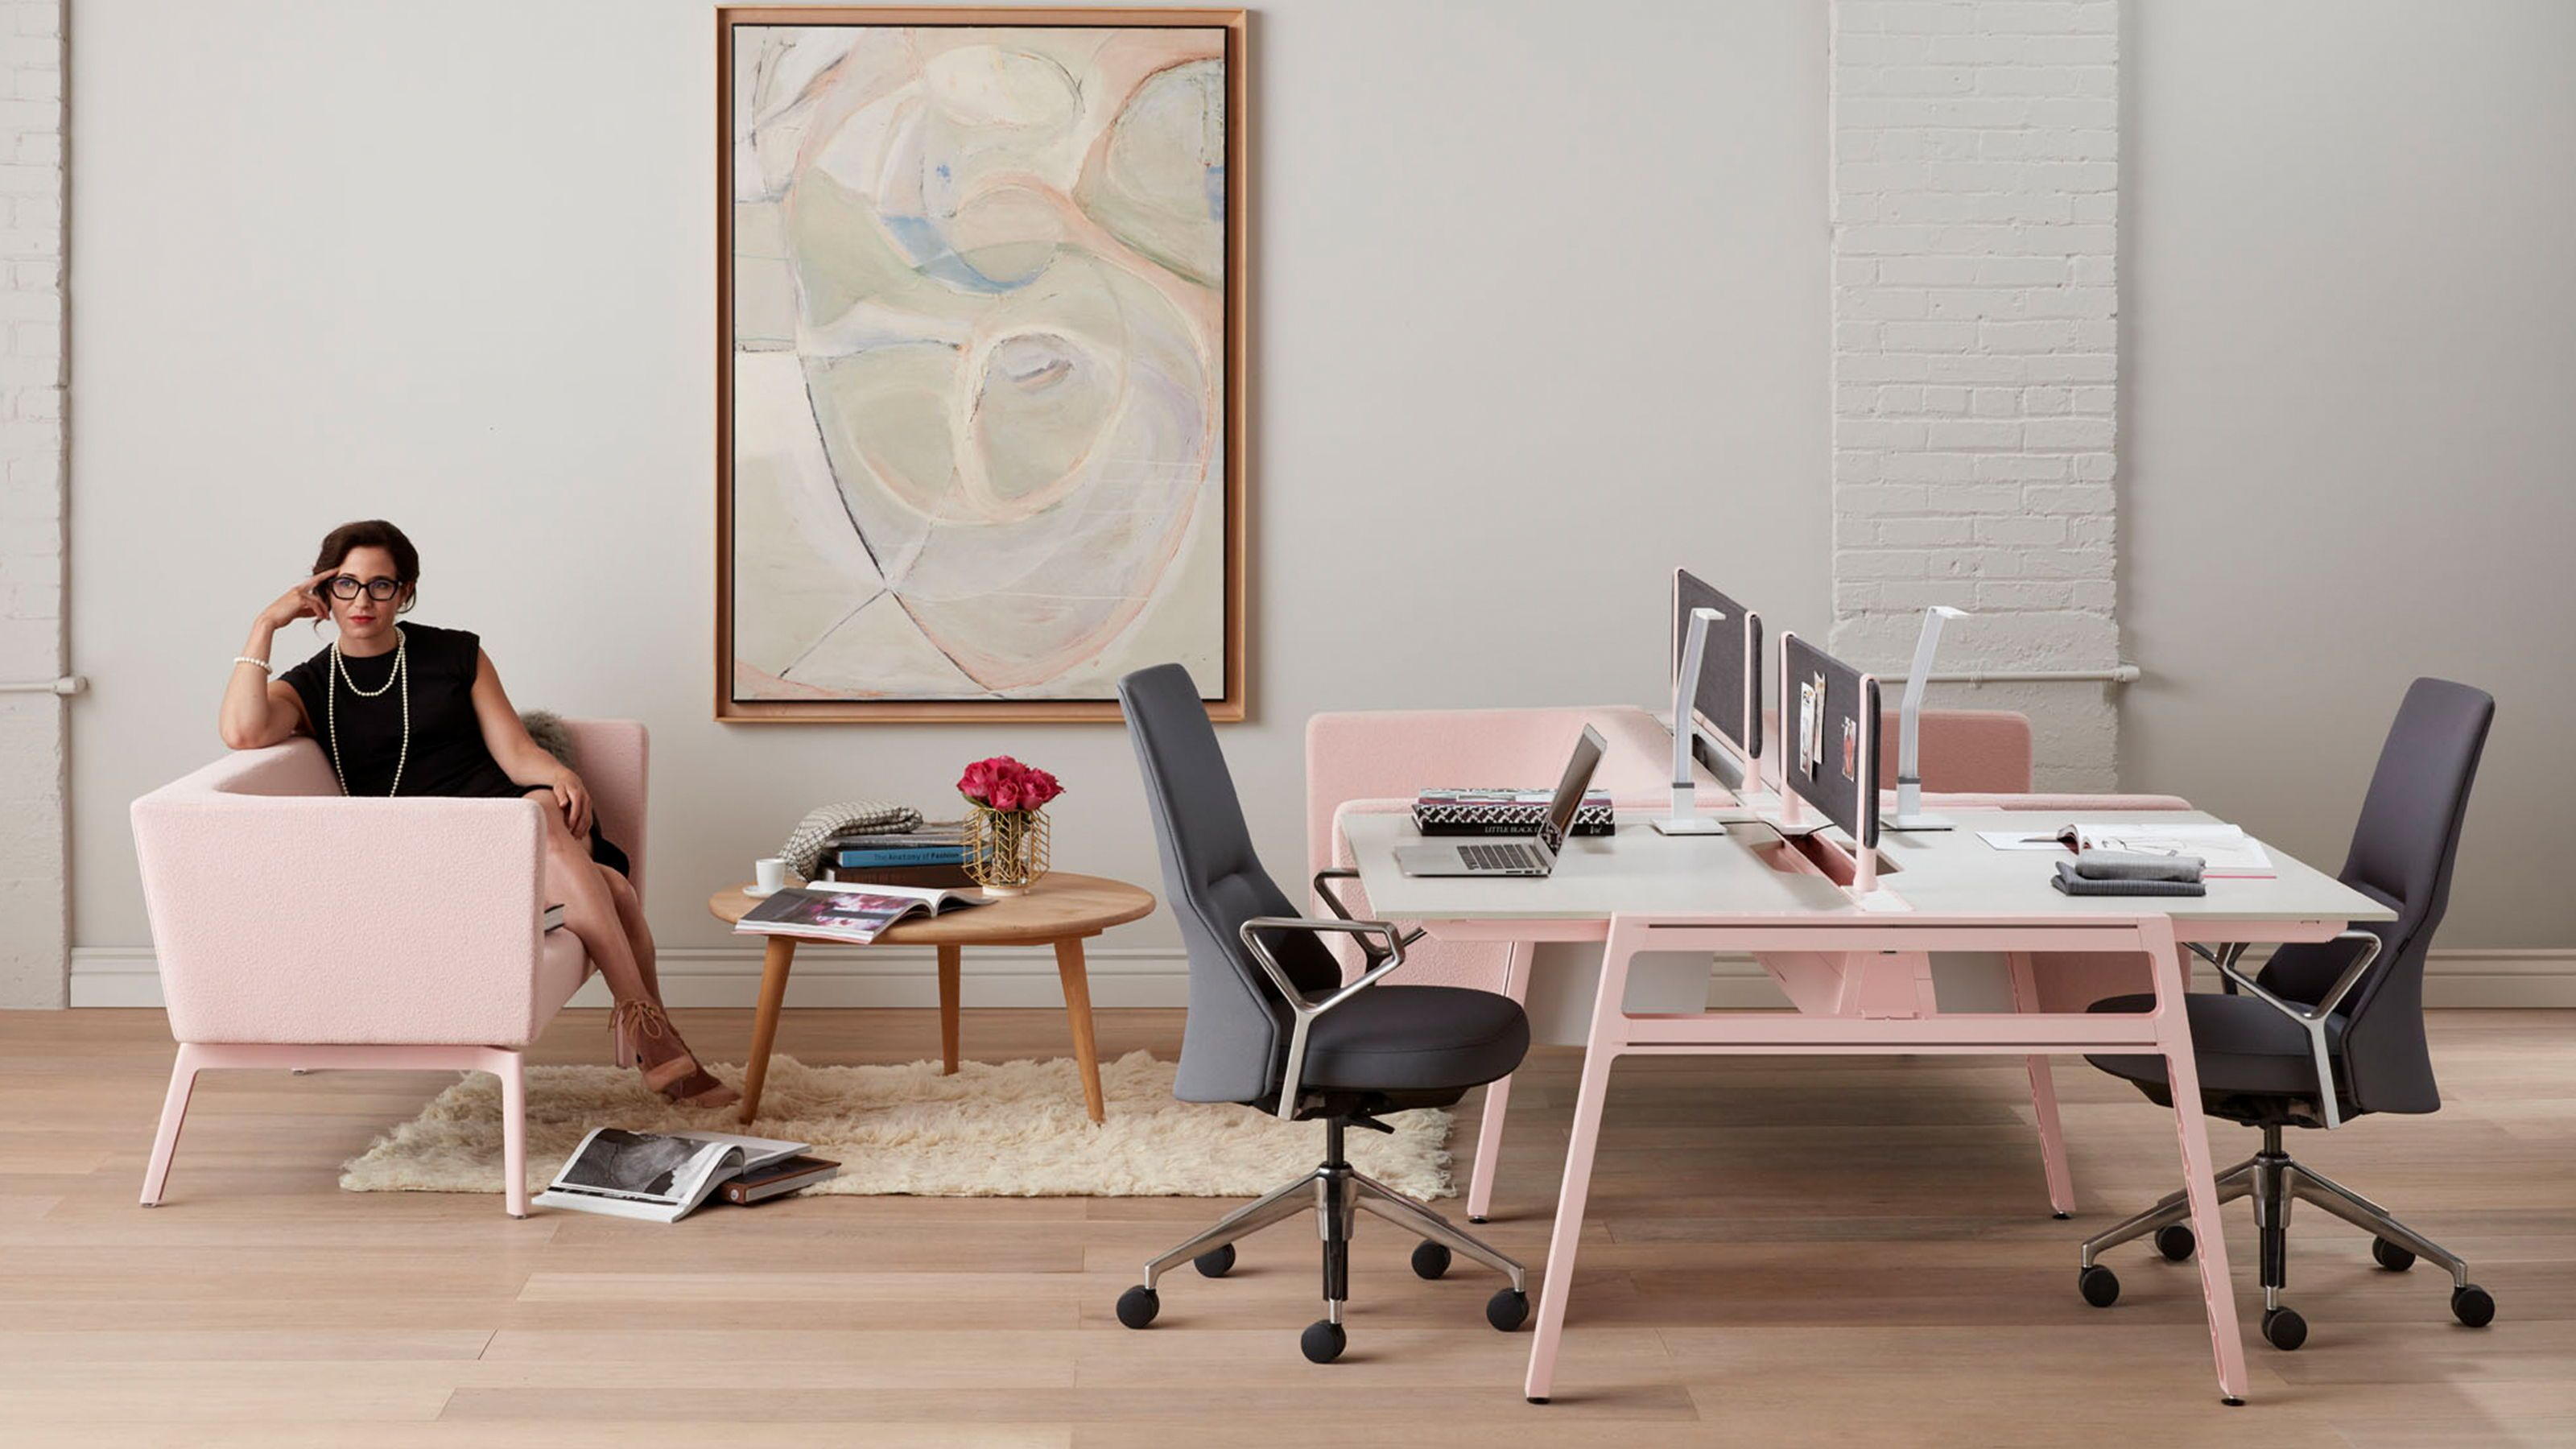 Bivi Modern Office Desk System By Turnstone Steelcase Modern Office Desk Steelcase Open Office Design